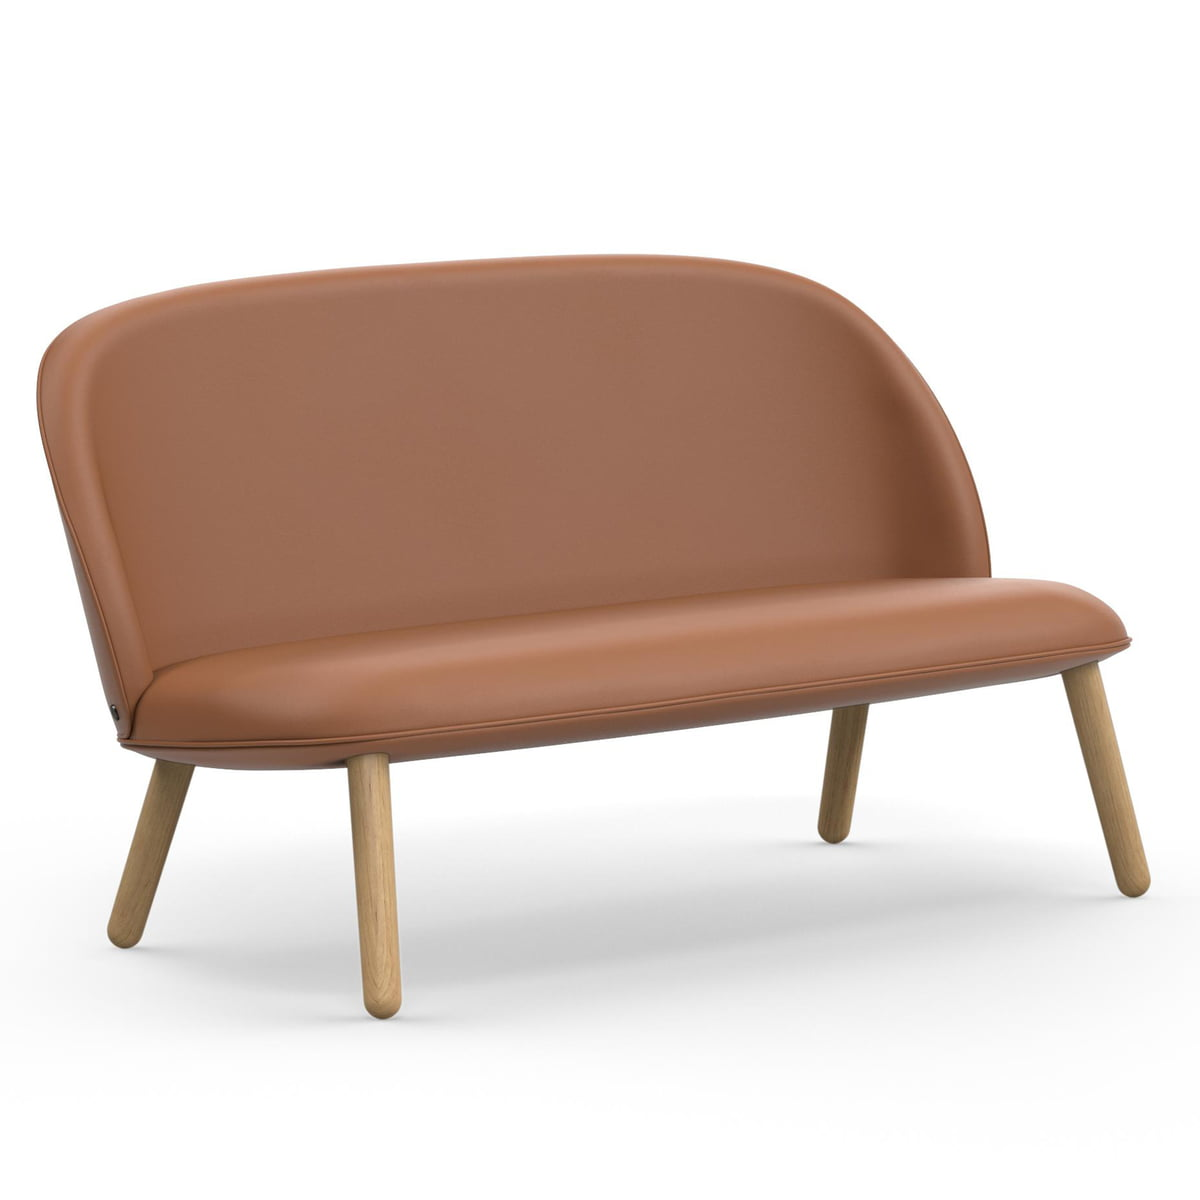 Ace Leder-Sofa von Normann Copenhagen